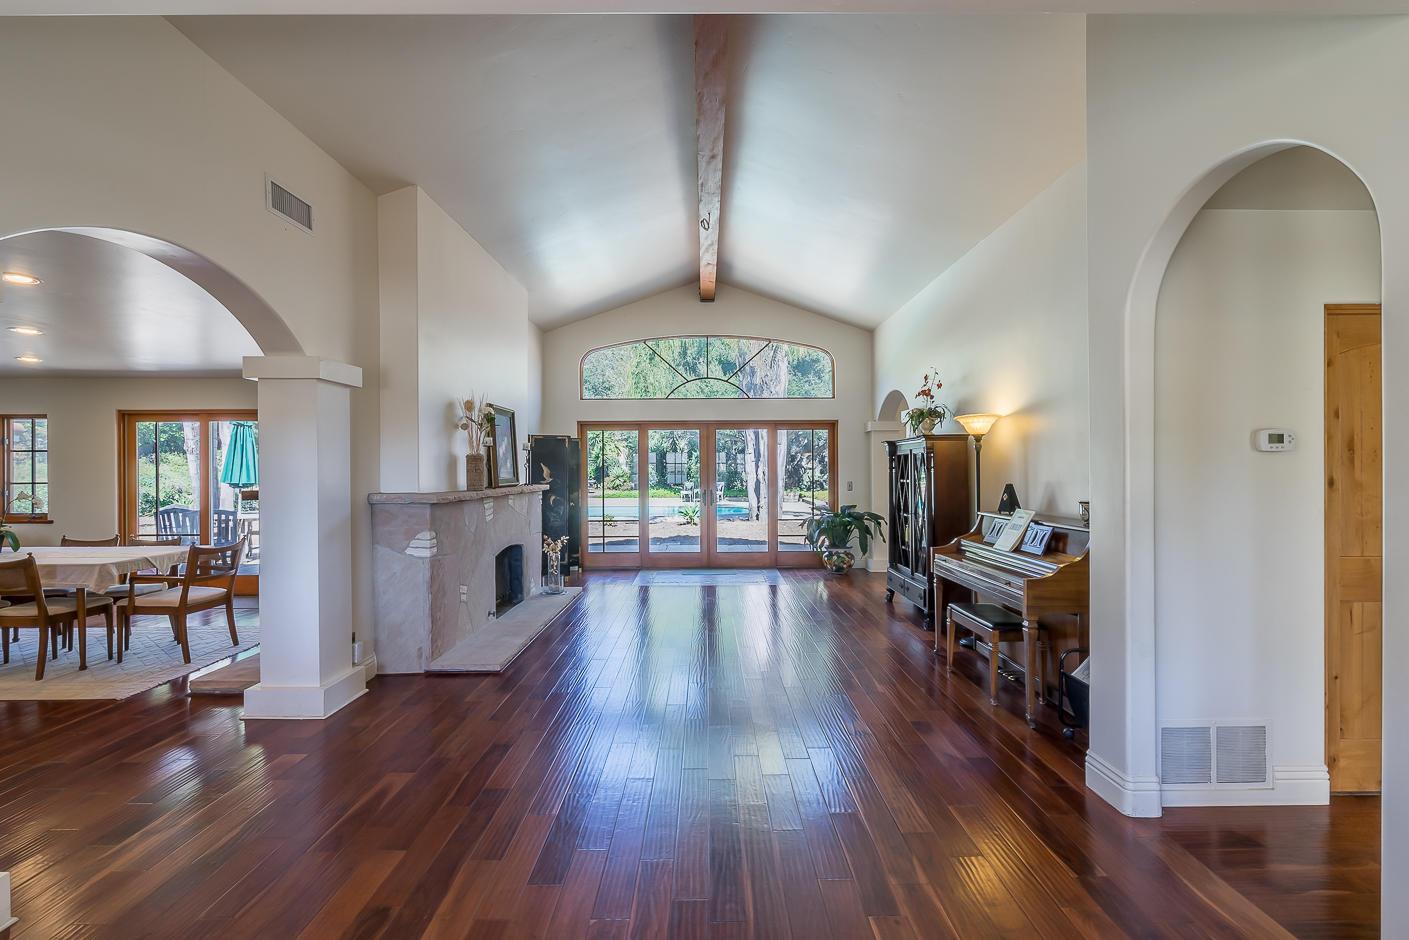 Property photo for 5530 Camino Cerralvo Santa Barbara, California 93111 - 17-3341